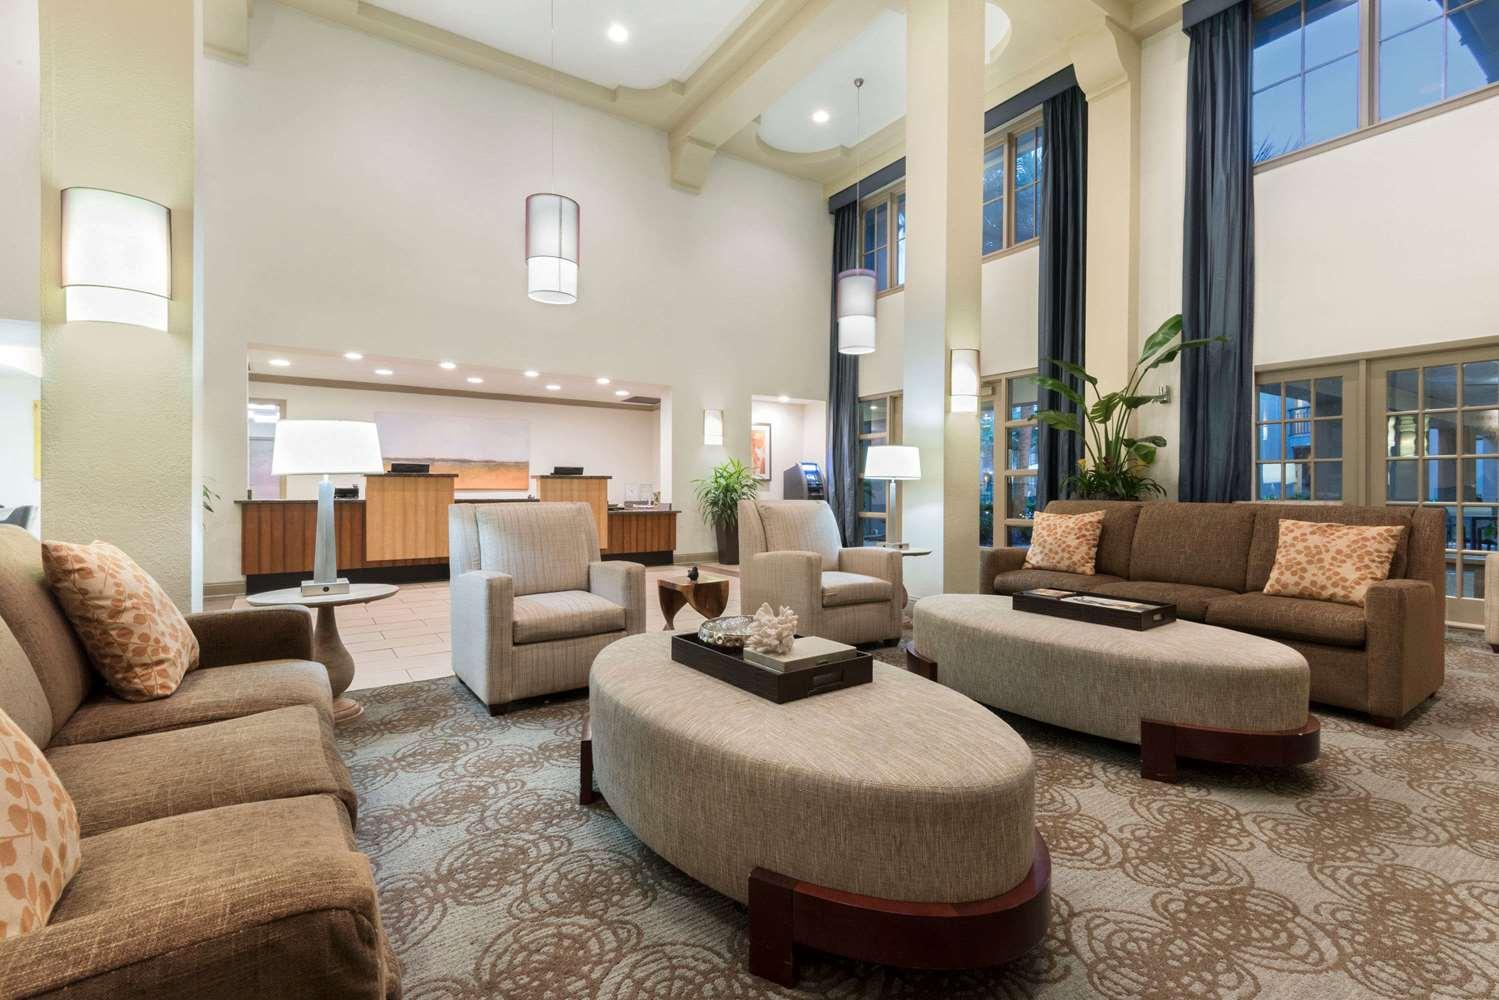 Lobby - Wyndham Garden Hotel Baton Rouge